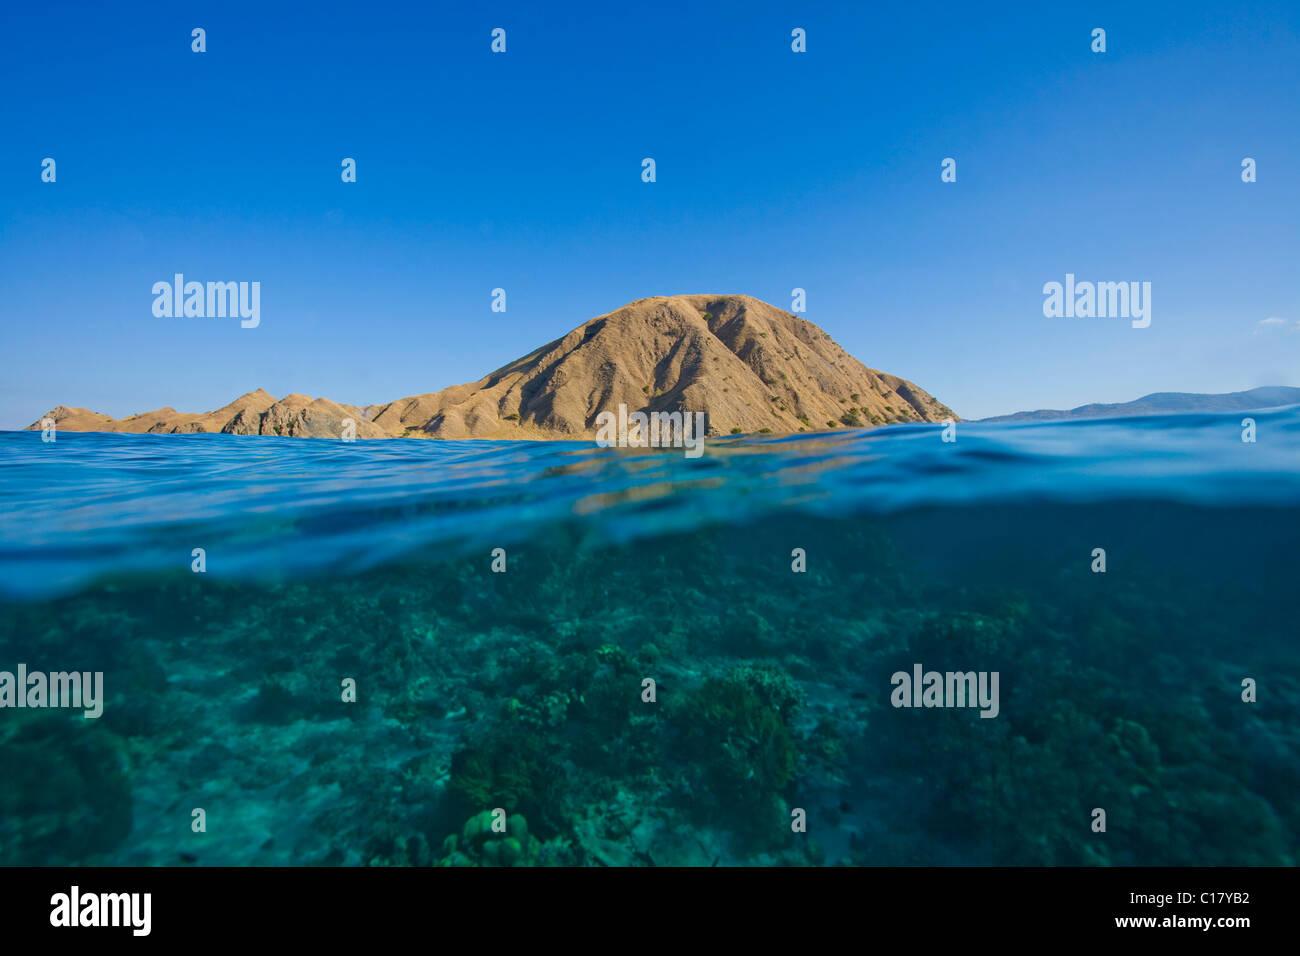 Coral reef, Komodo, Lesser Sunda Islands, Indonesia, South East Asia - Stock Image